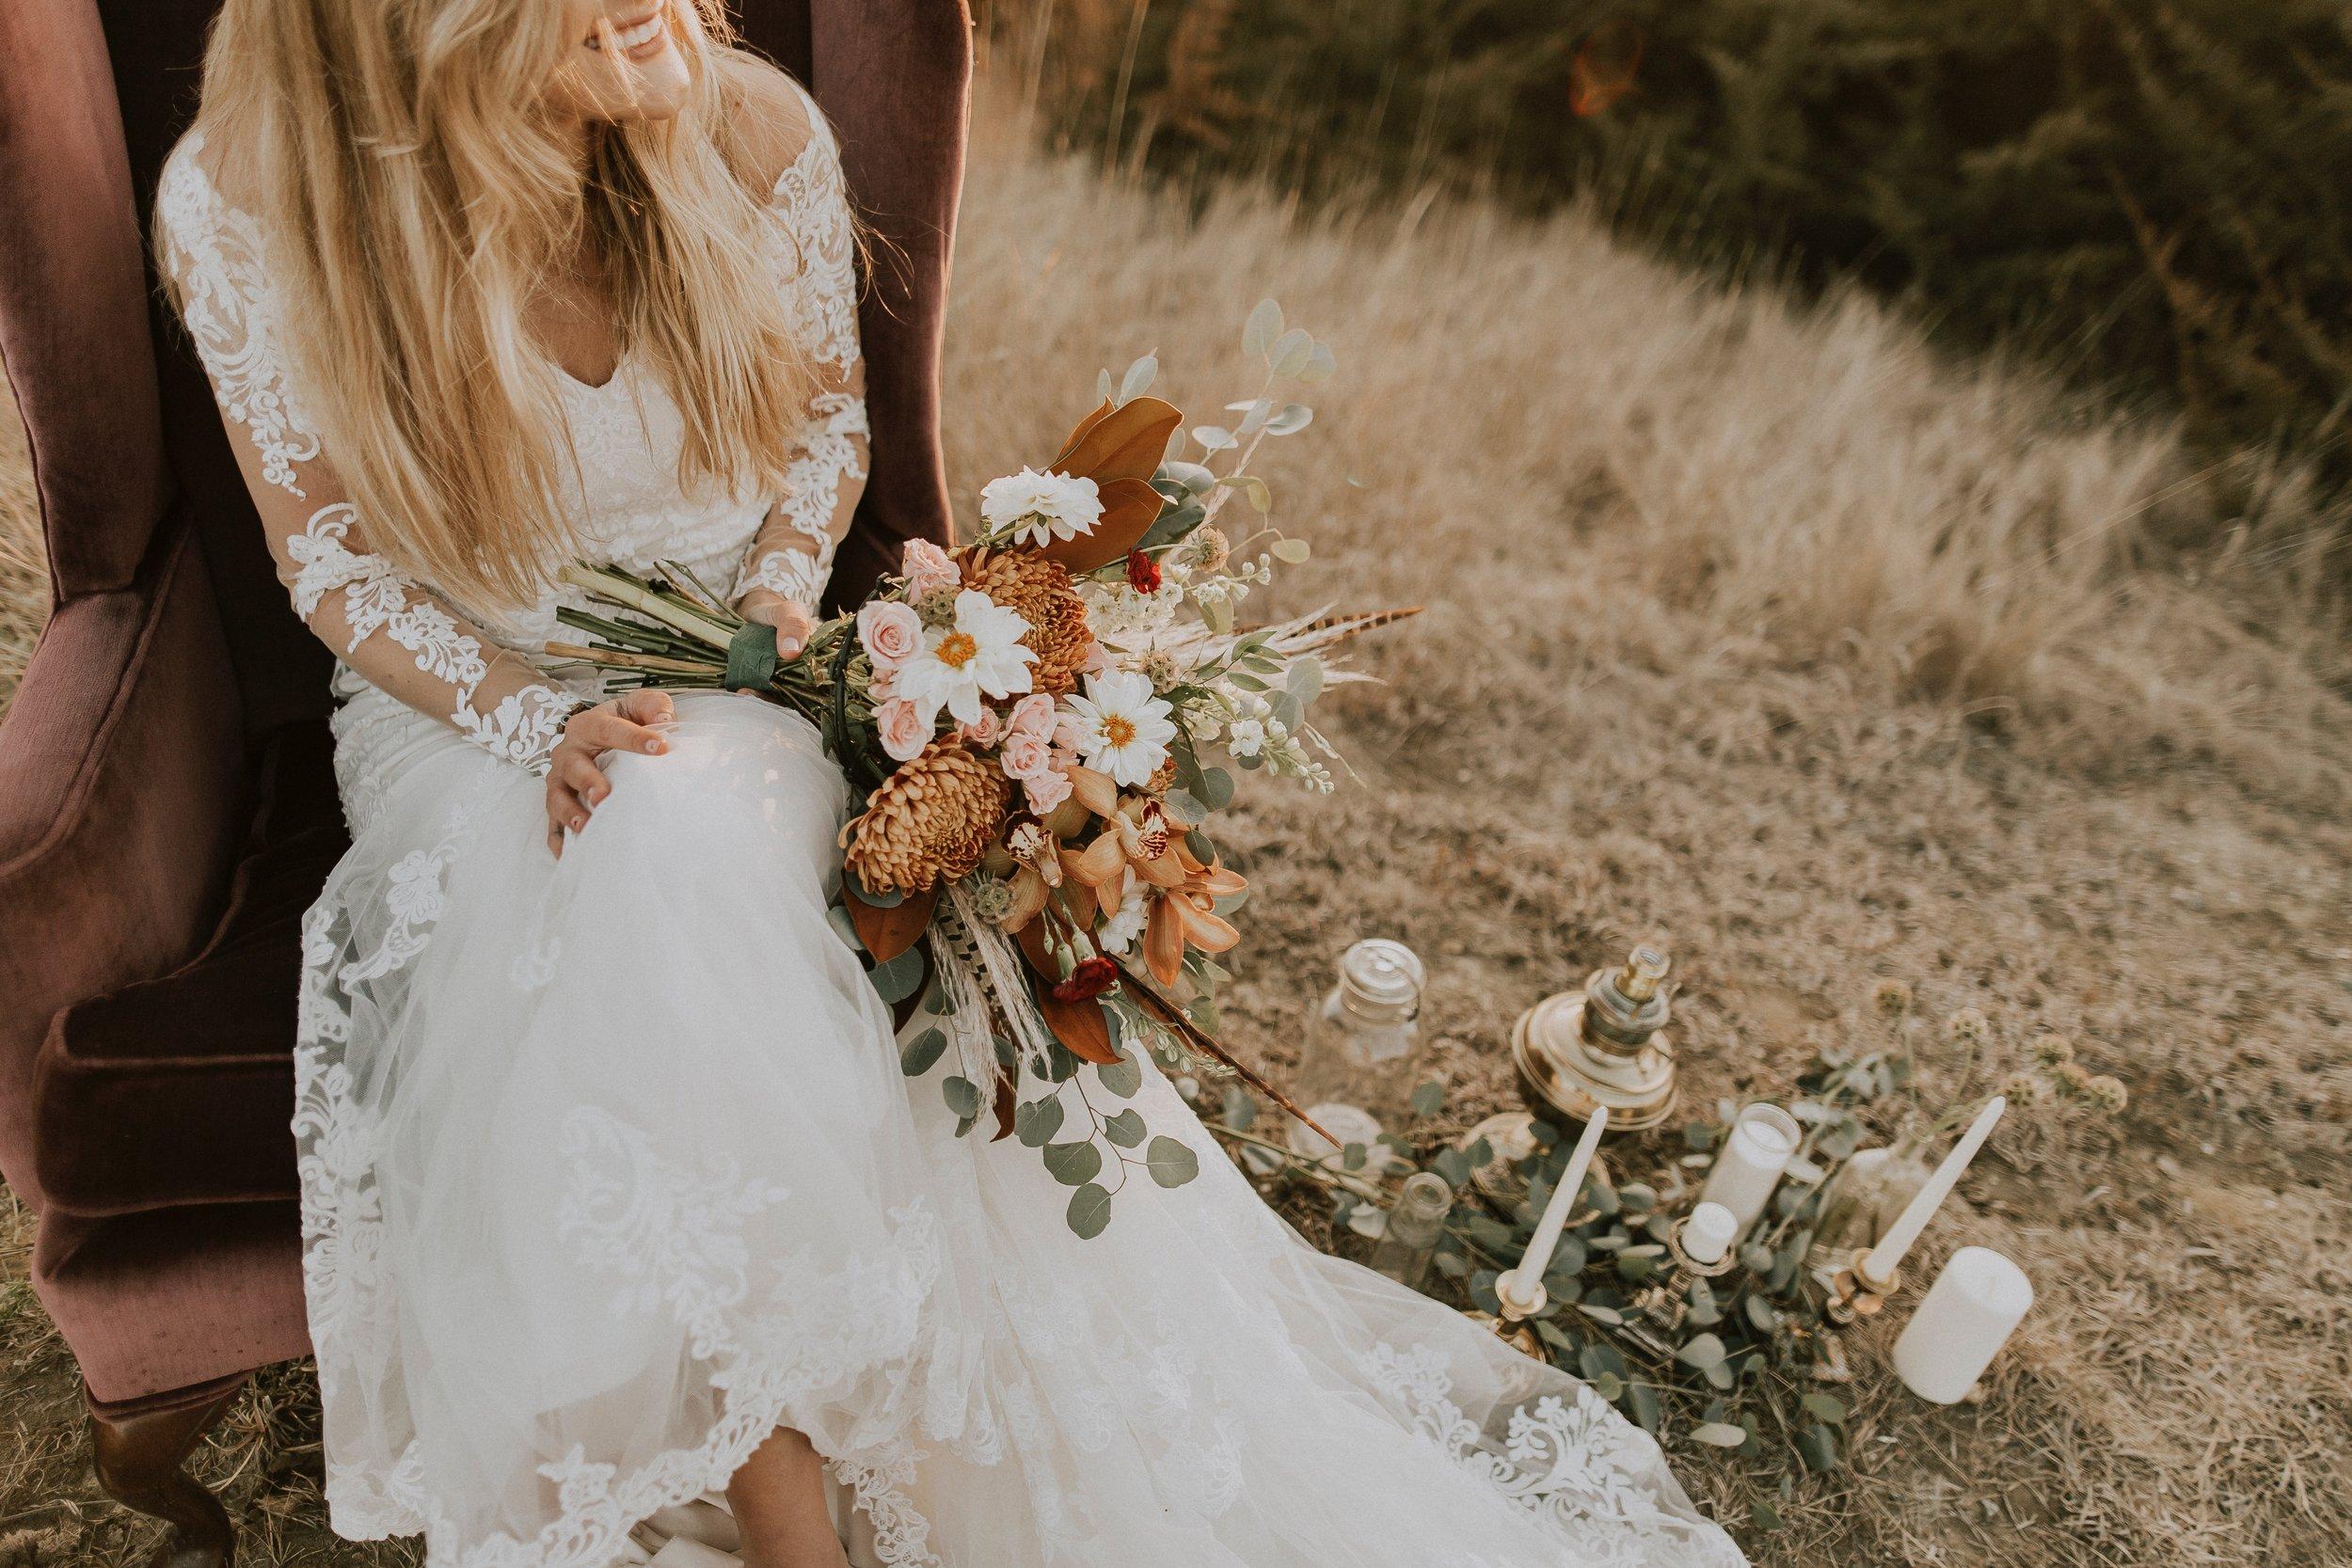 Wedding: Small Budget